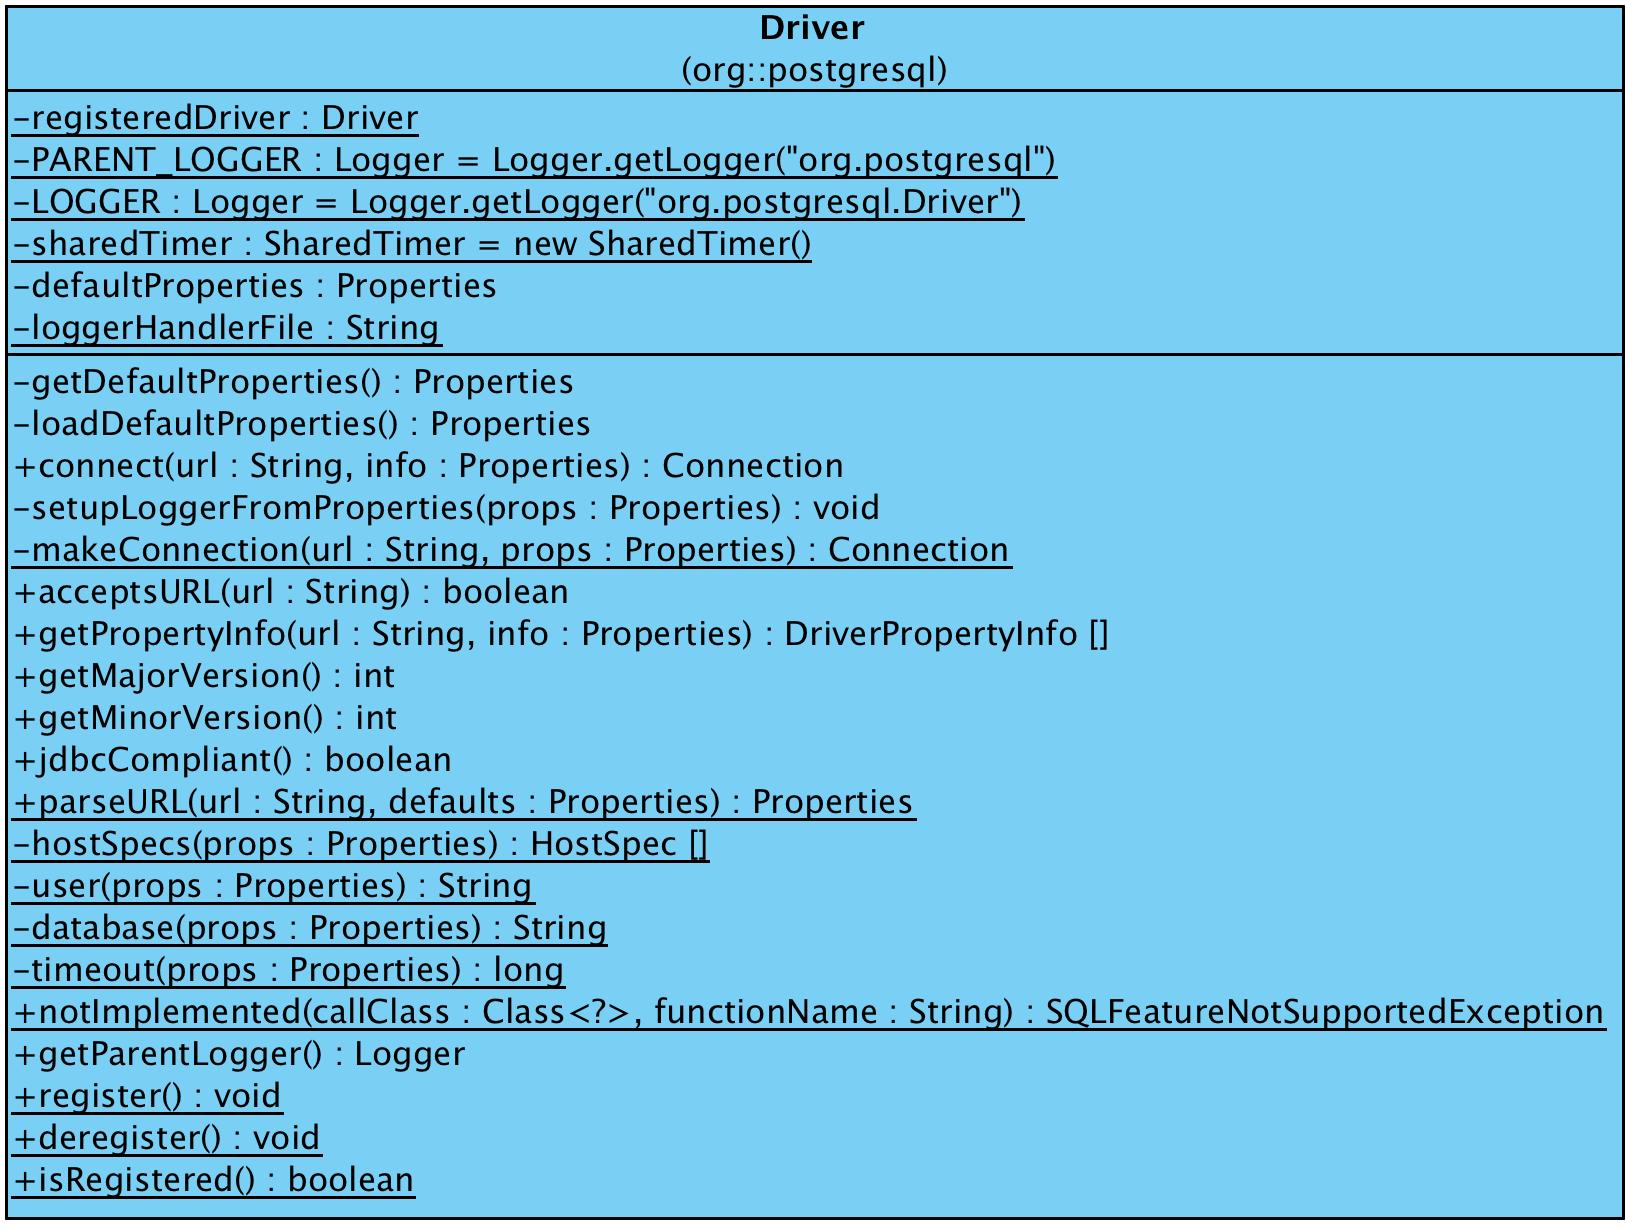 https://raw.githubusercontent.com/liweinan/blogpicbackup/master/data/jdbc/org.postgresql.Driver.png